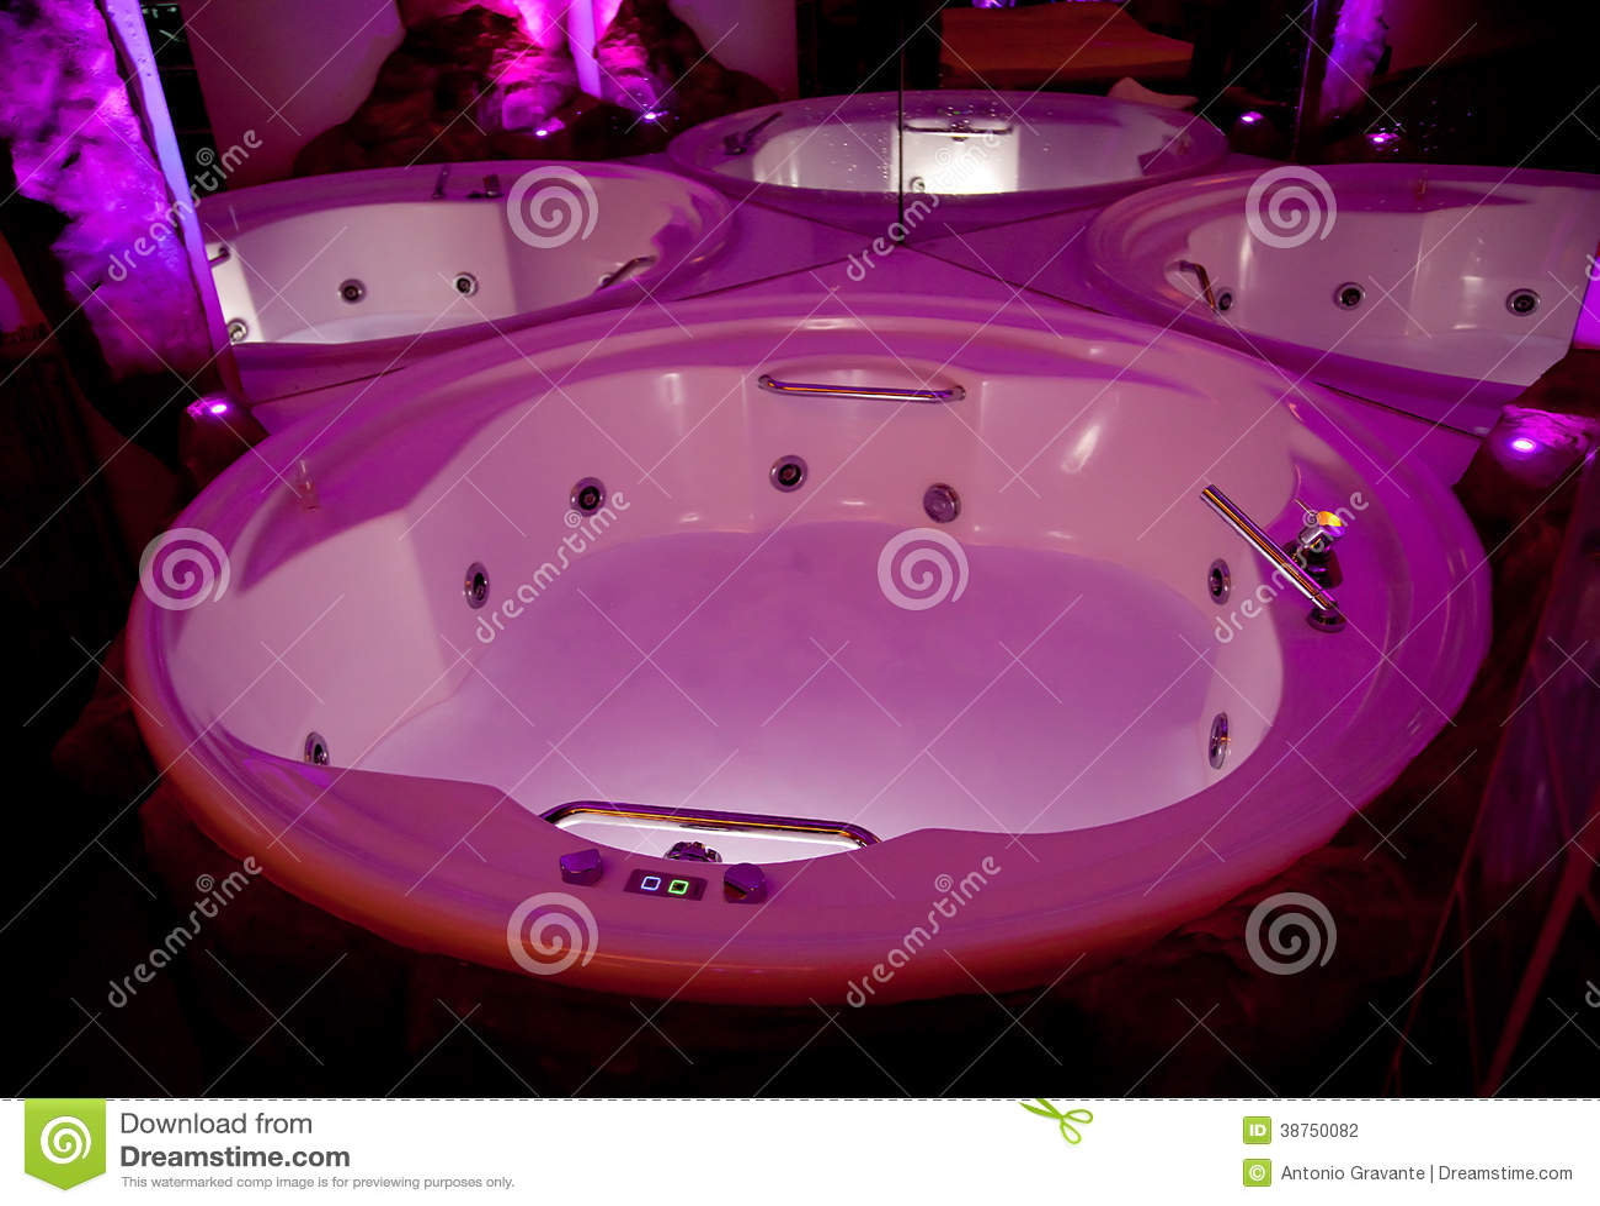 Whirlpool bath stock photo. Image of care, bathtub, bathroom - 38750082